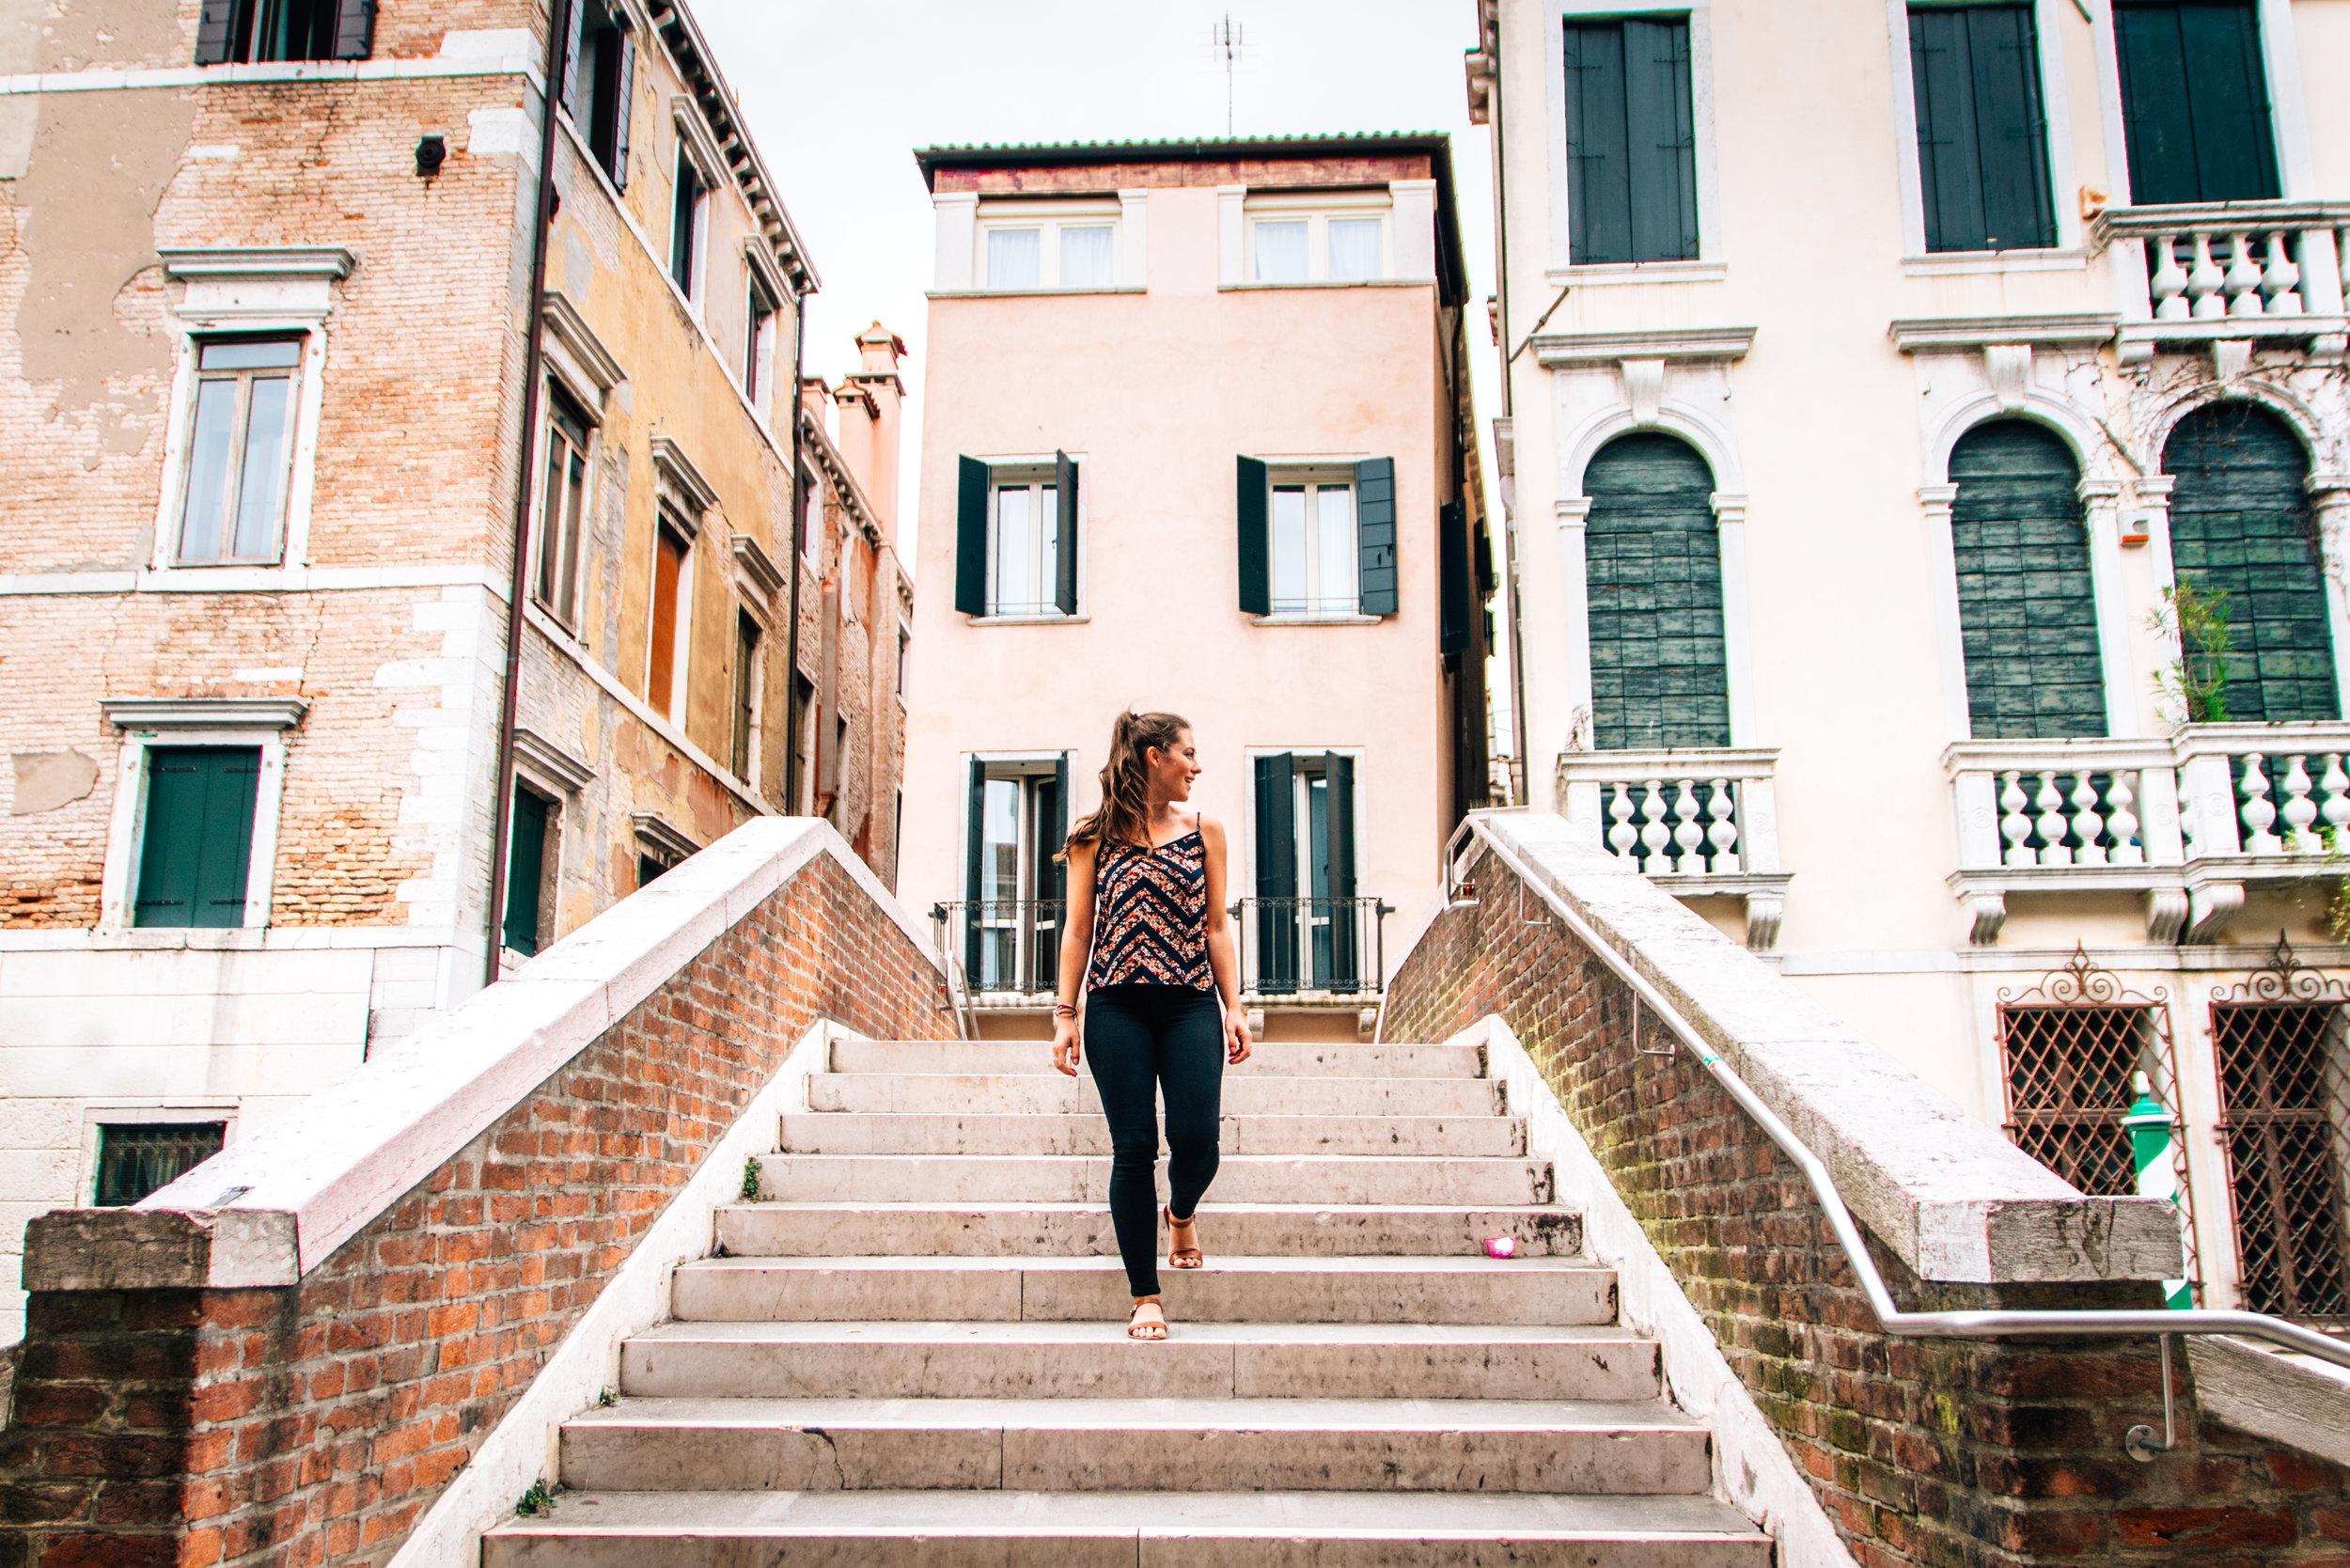 Walking around Venice on a budget